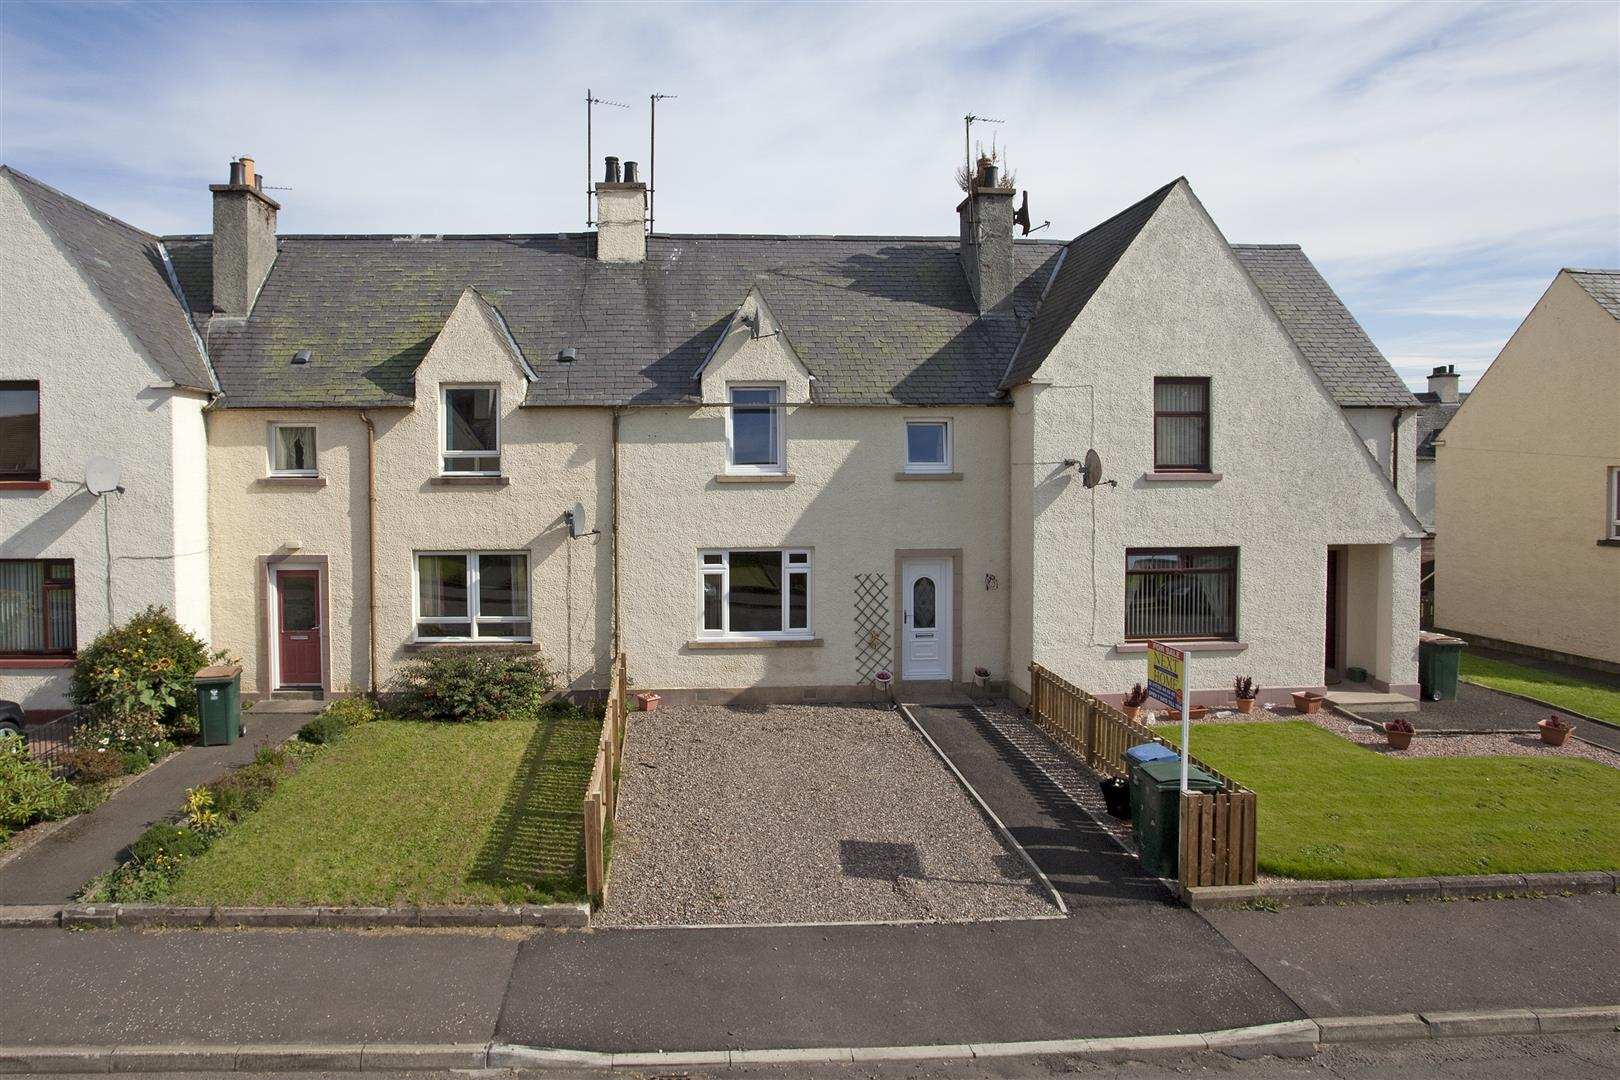 16, Morrison Terrace, Alyth, Perthshire, PH11 8BY, UK